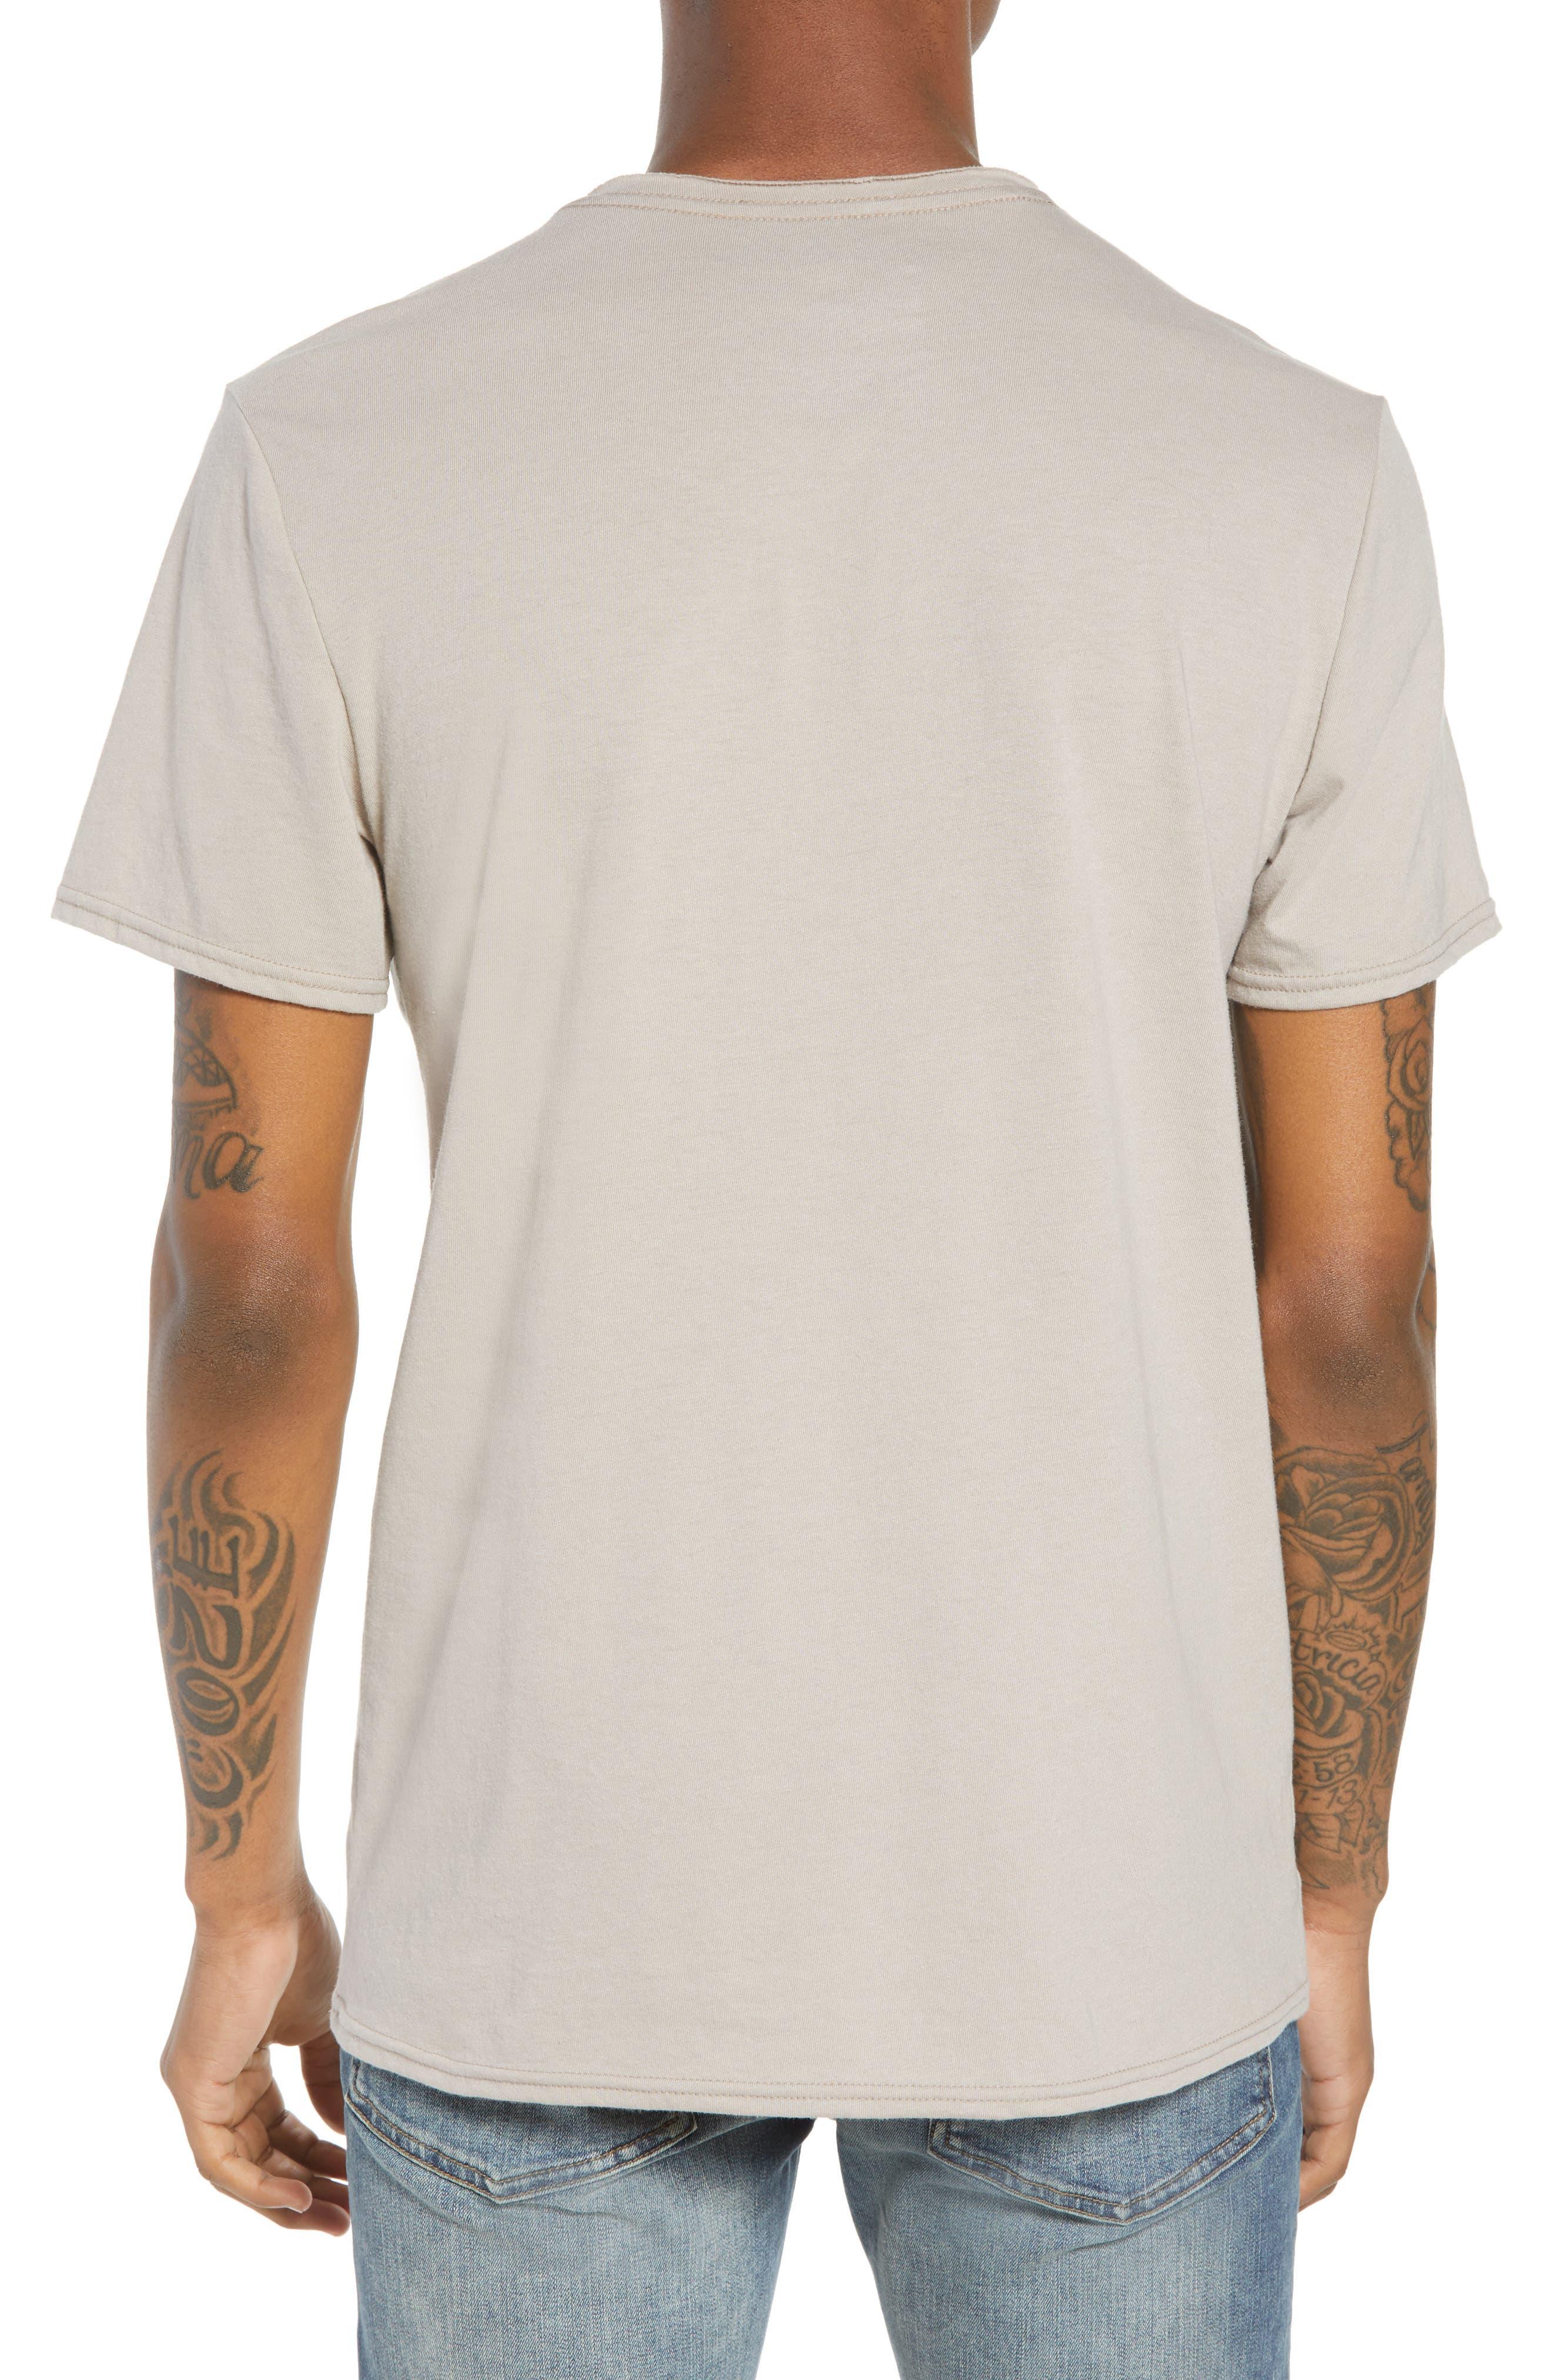 Tri-Splice T-Shirt,                             Alternate thumbnail 2, color,                             Beige Navy Sun Splice